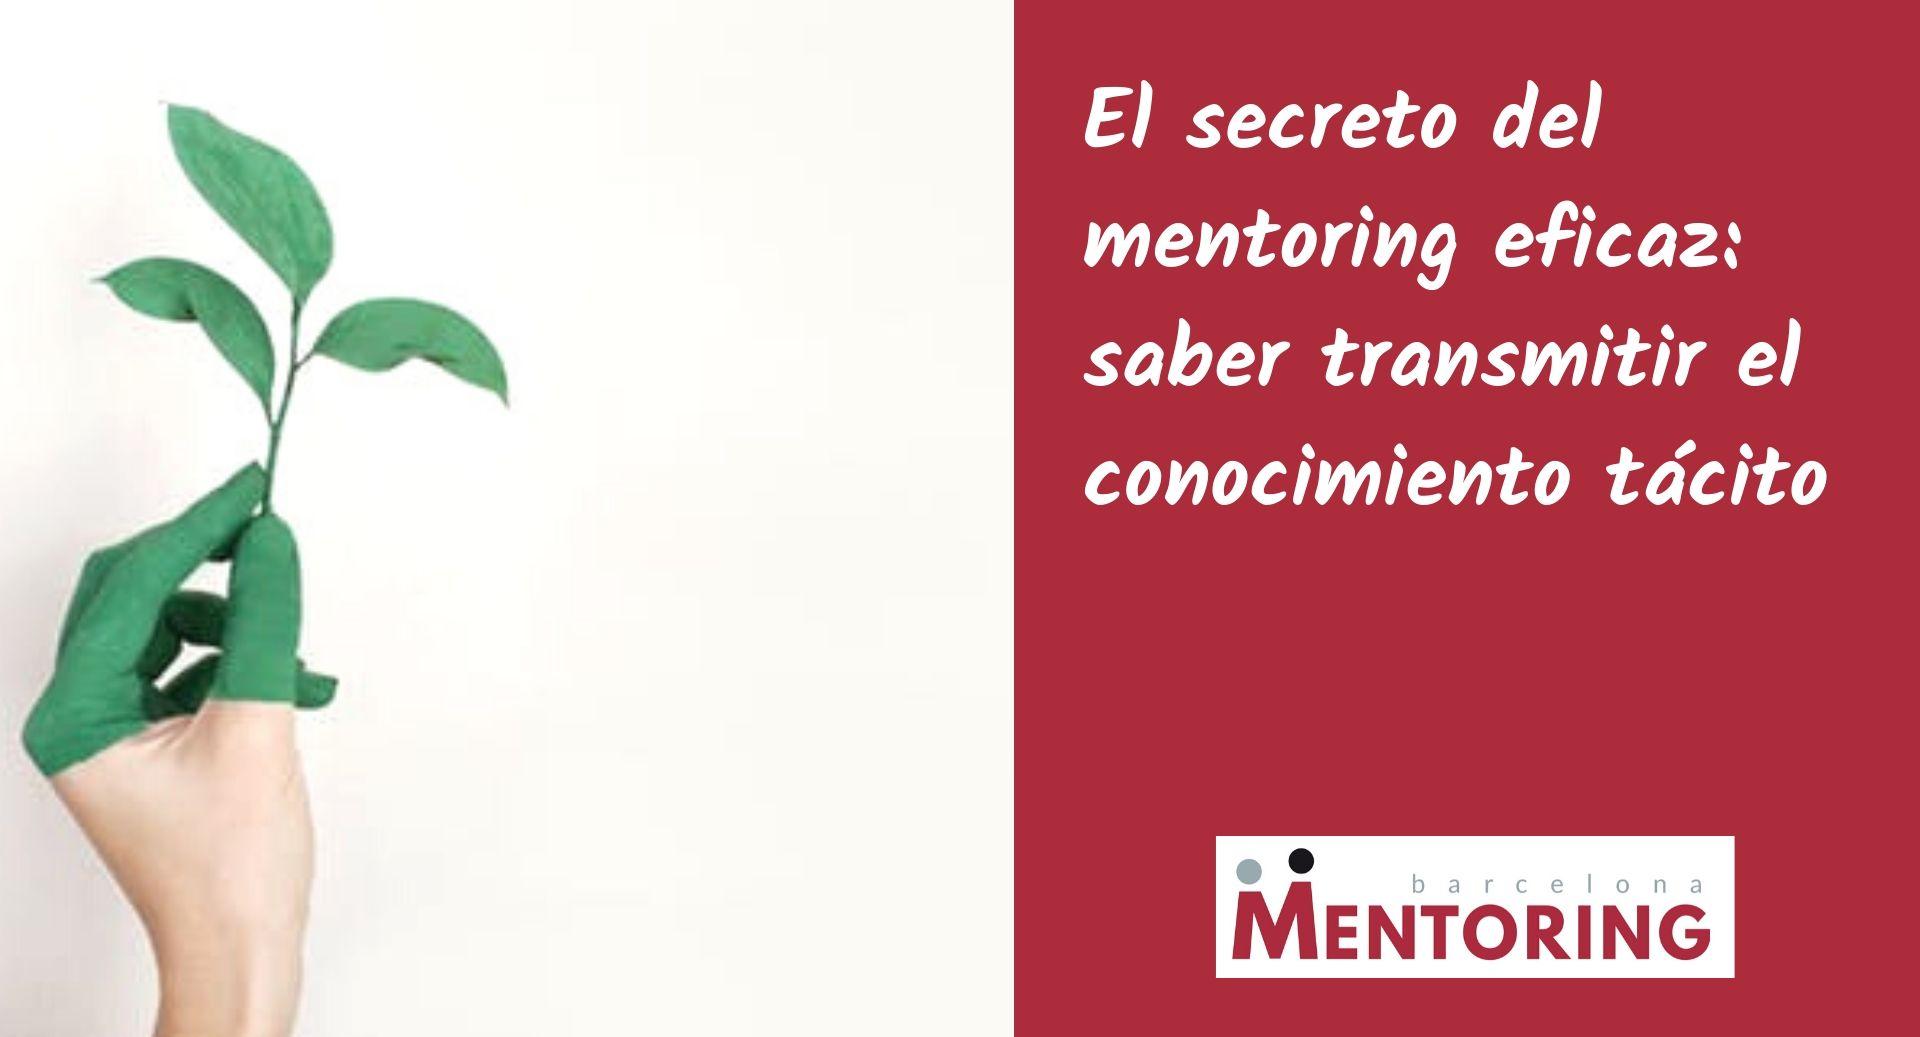 mentoring eficaz